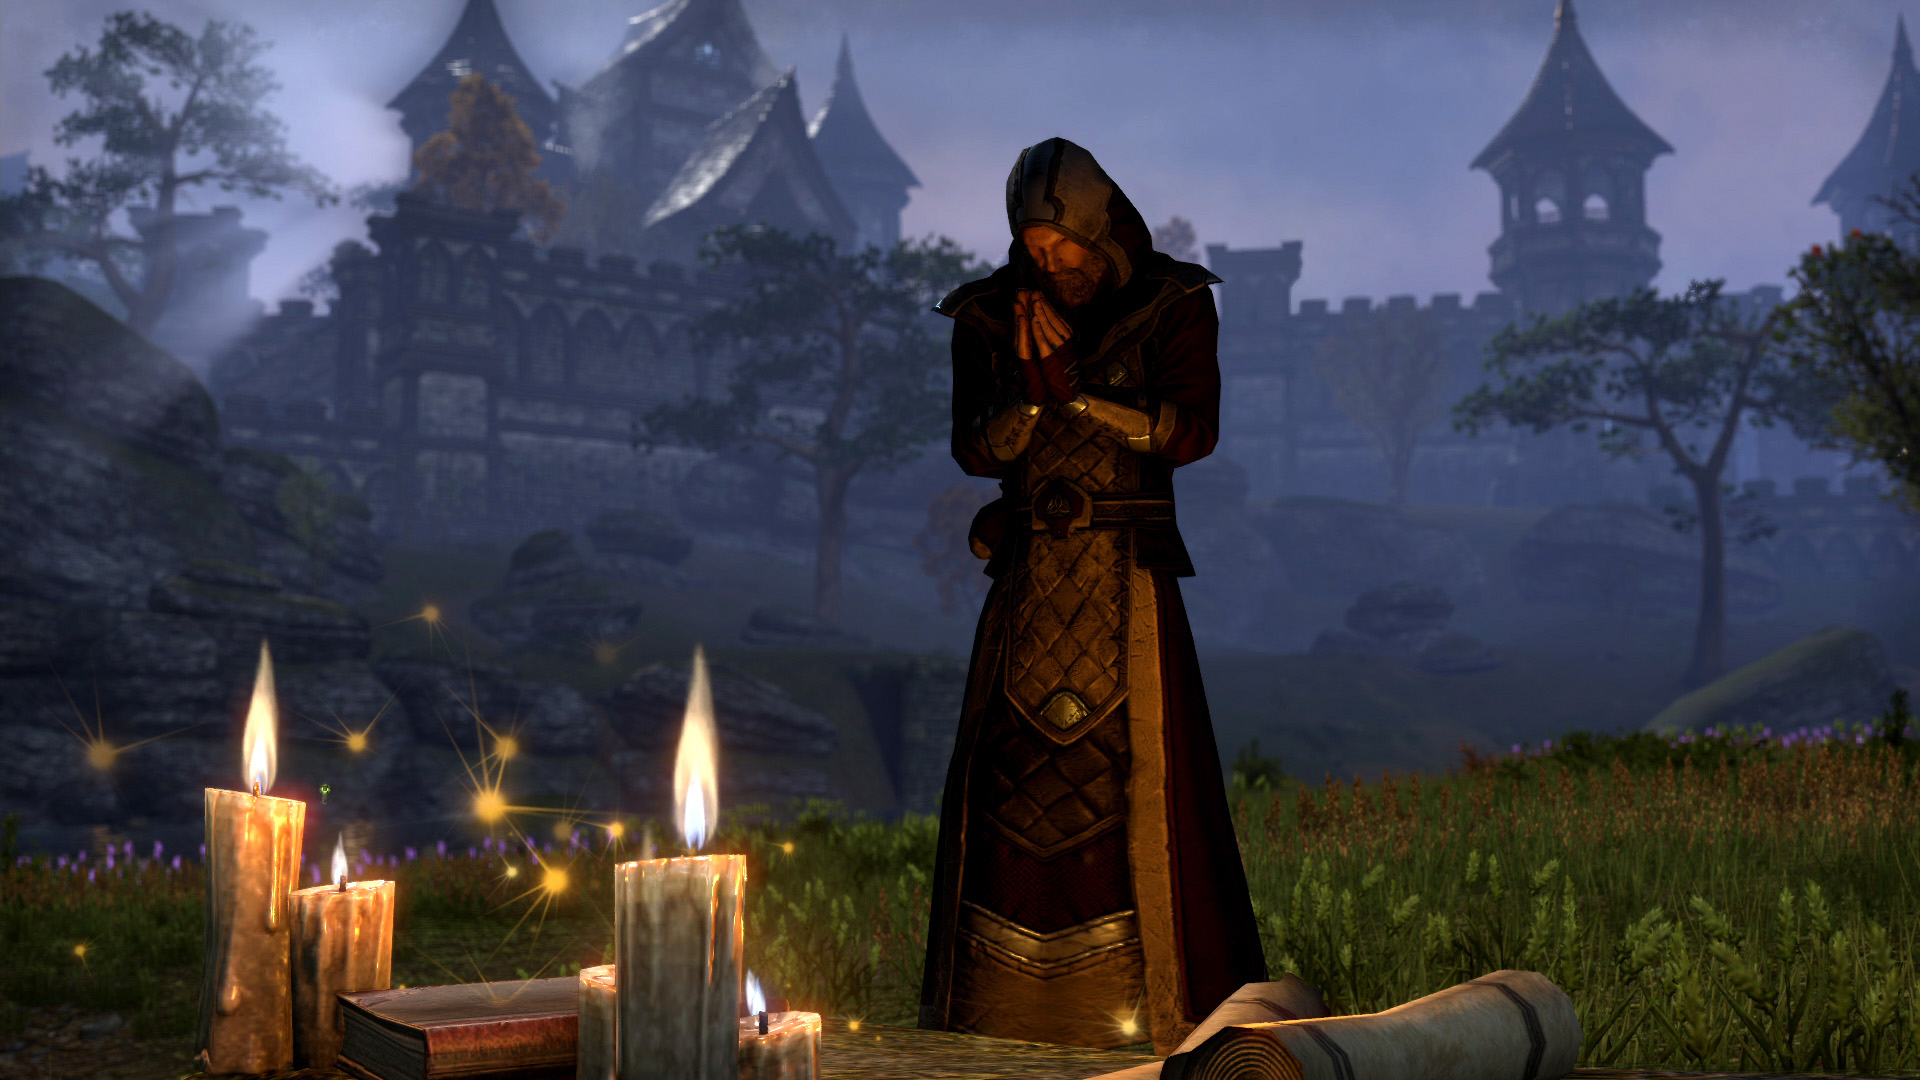 Elder Scrolls Online Rated M By ESRB, Bethesda Disagrees #30394